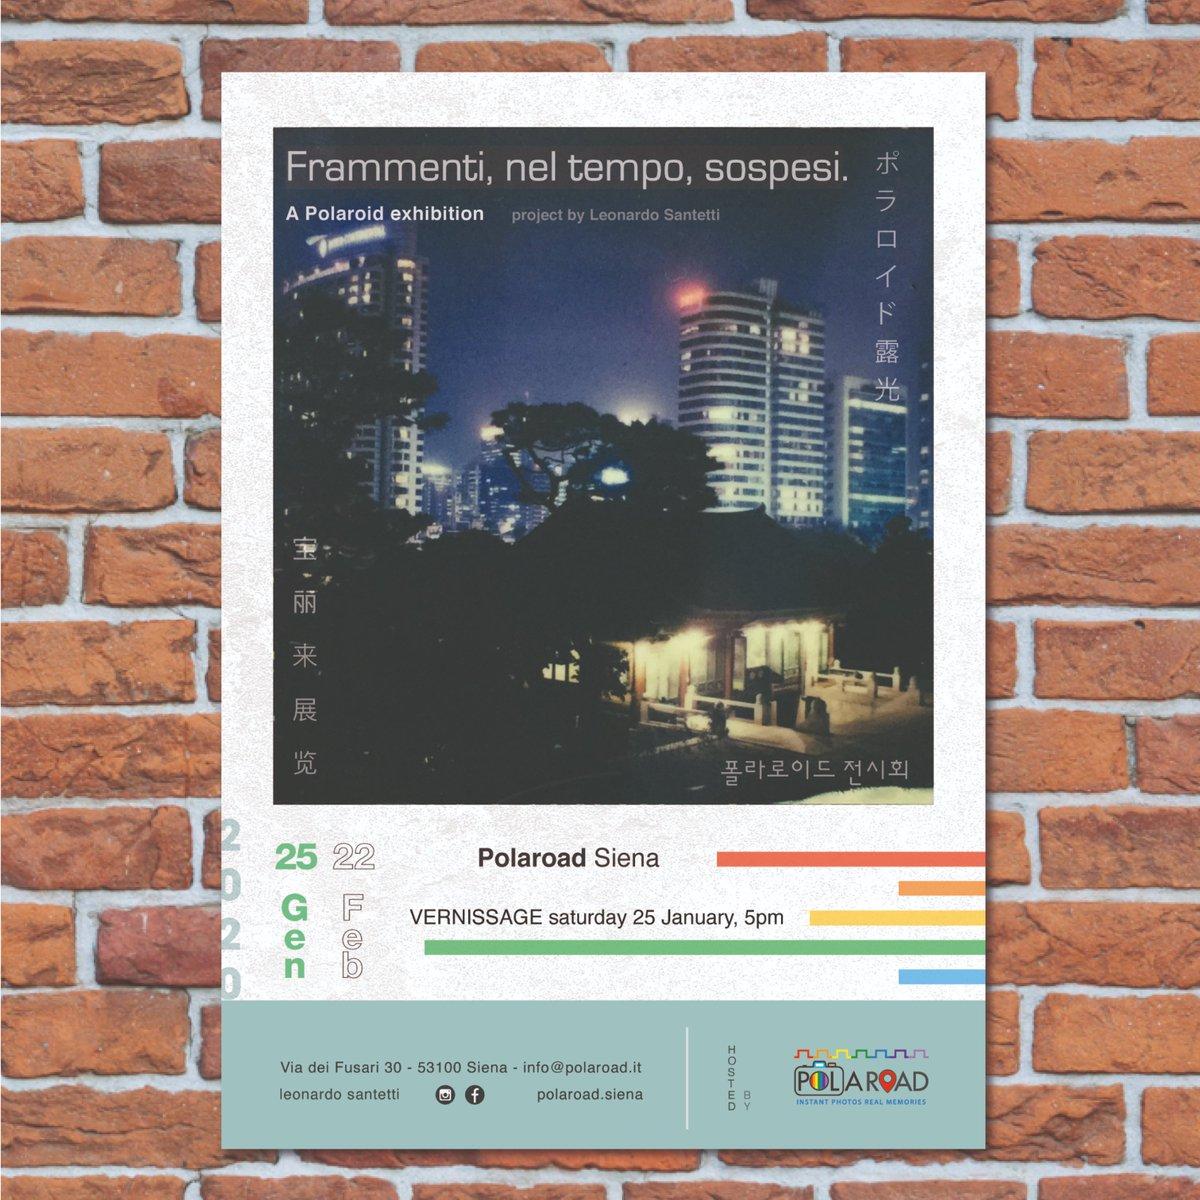 Polaroid Exhibition   SIENA, ITALY @polaroidorignls  opening 25 January 2020 5 p.m. #Polaroid #Instantphotography #analogphotography #stories #keepfilmalive #makerealphotos  https://www.instagram.com/p/B7WvmsICyeH/pic.twitter.com/gBuqKj78x6